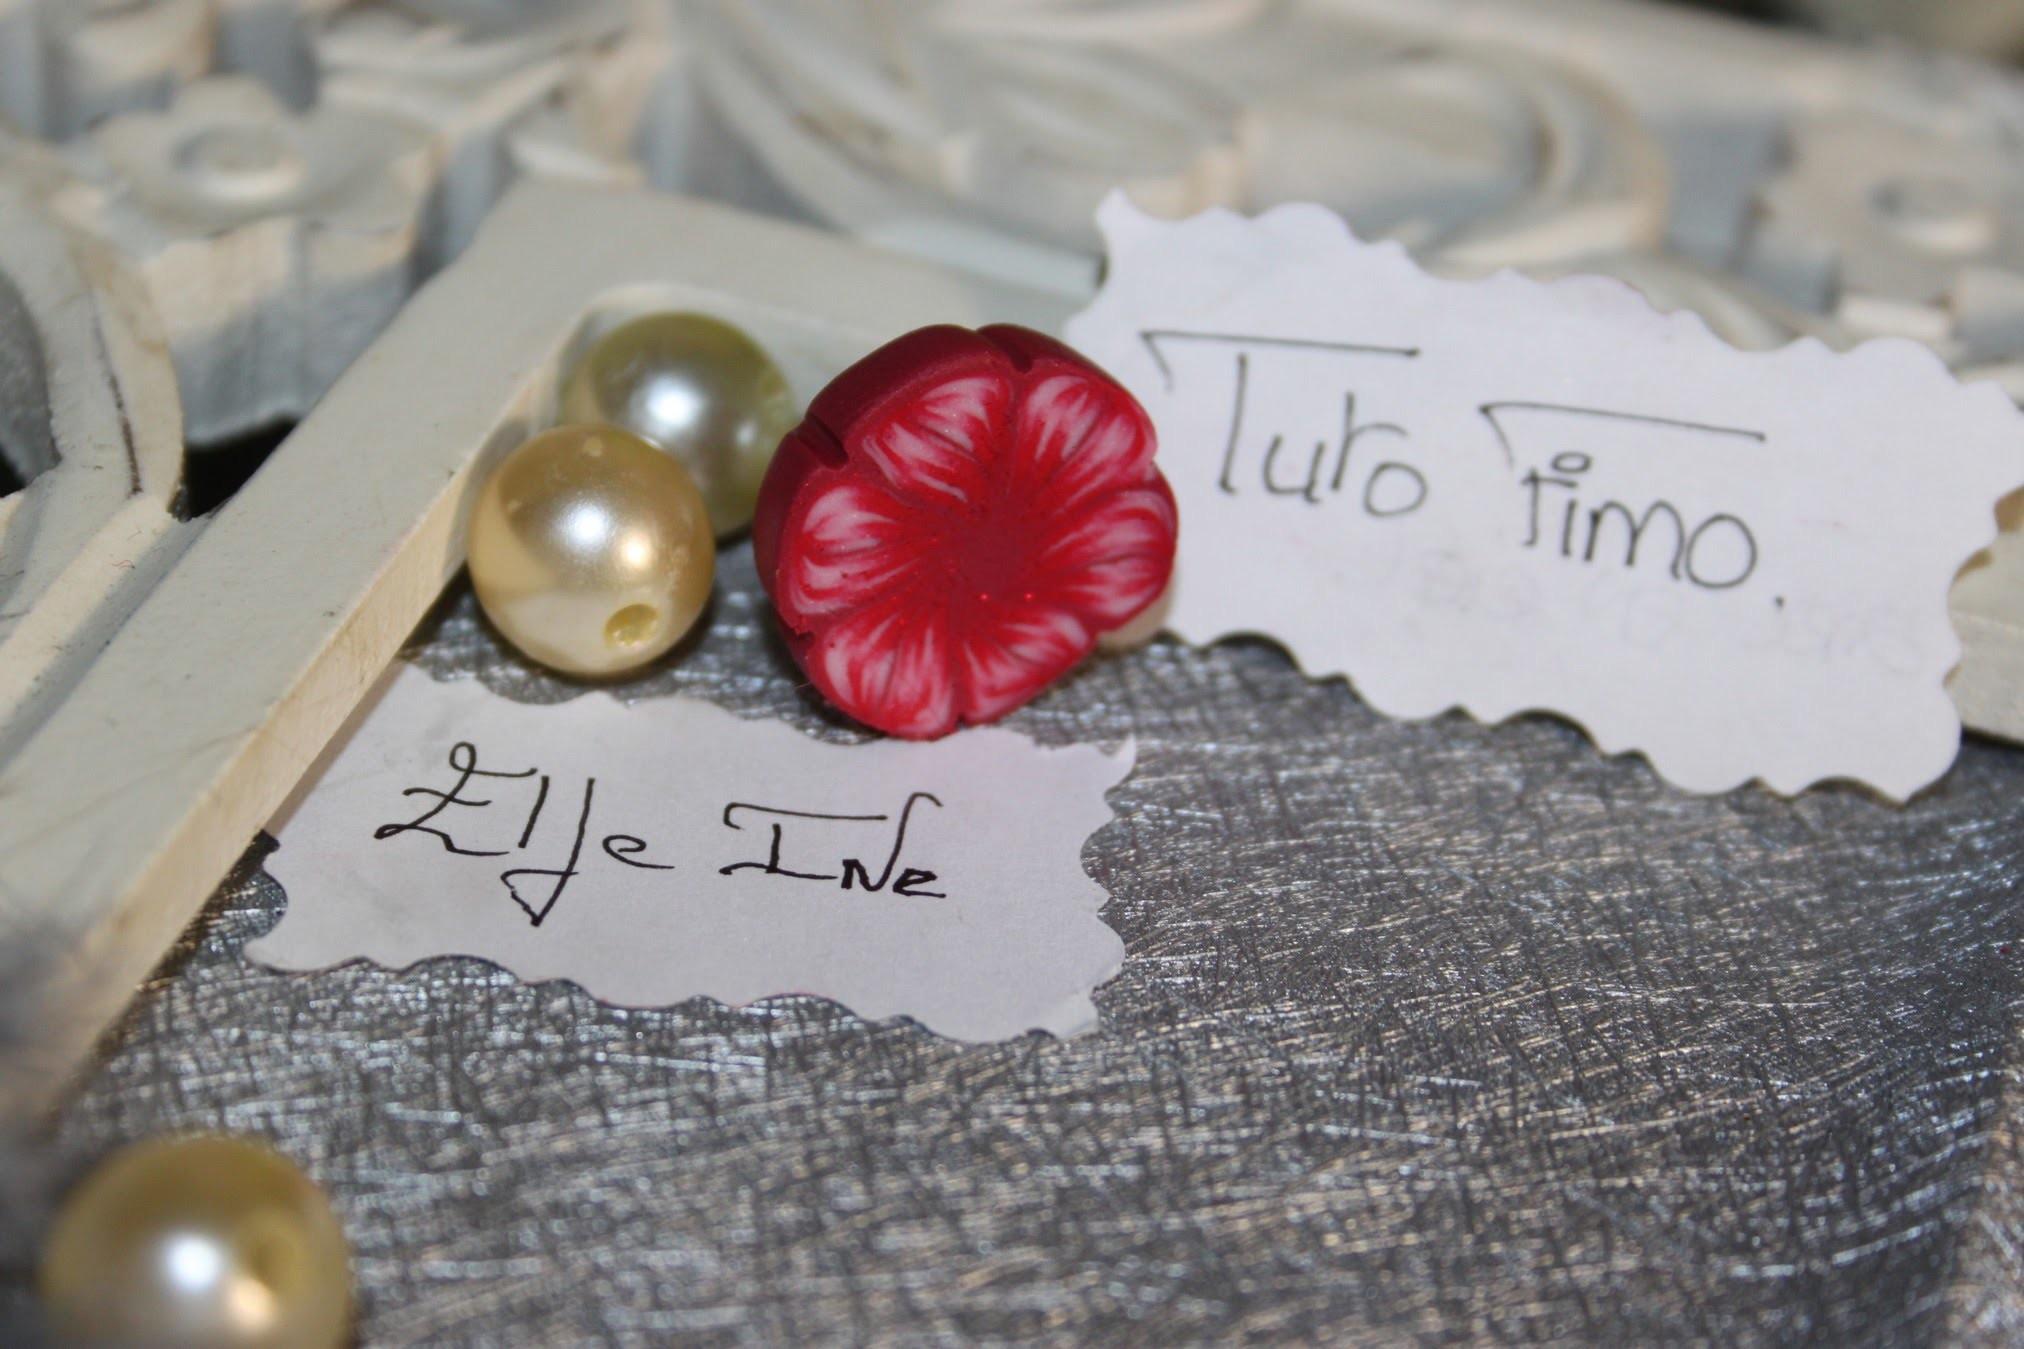 [♥✿ Tuto Fimo : Cane fleur ✿♥] ~ [♥✿ Polymer Clay Tutorial : Cane flowers ✿♥]